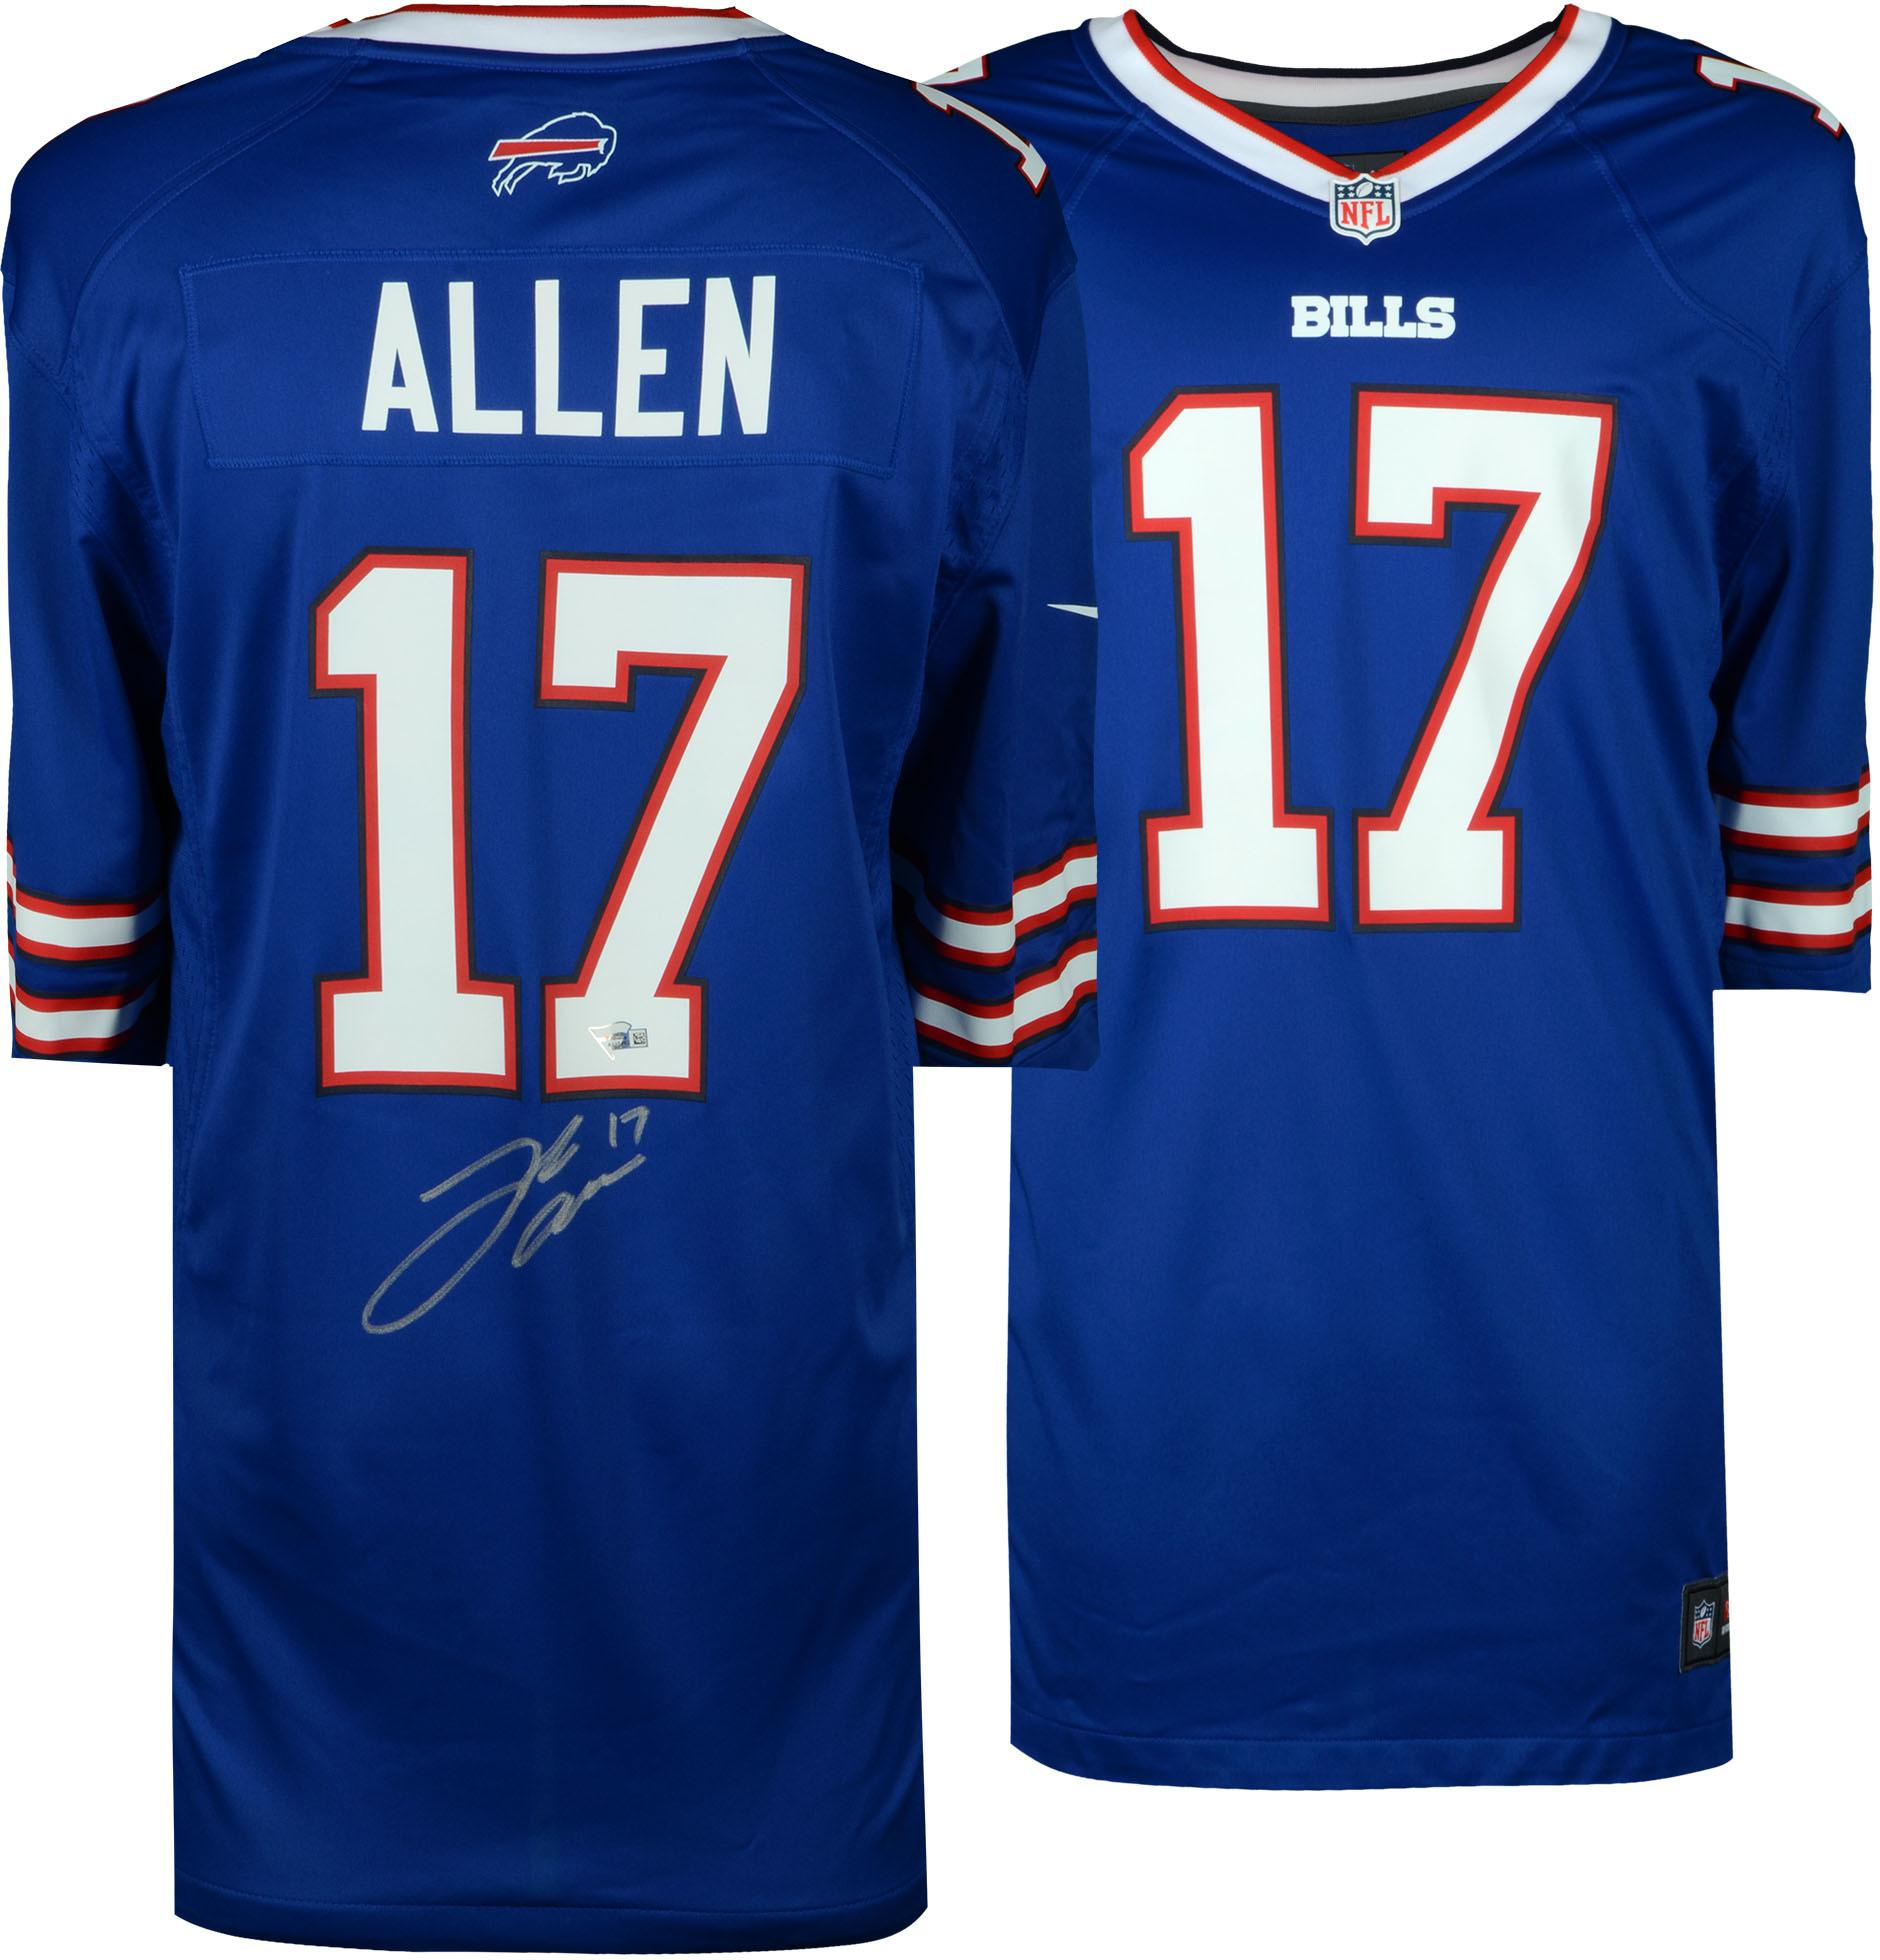 Josh Allen Buffalo Bills Autographed Blue Game Jersey - Fanatics Authentic Certified - Walmart.com